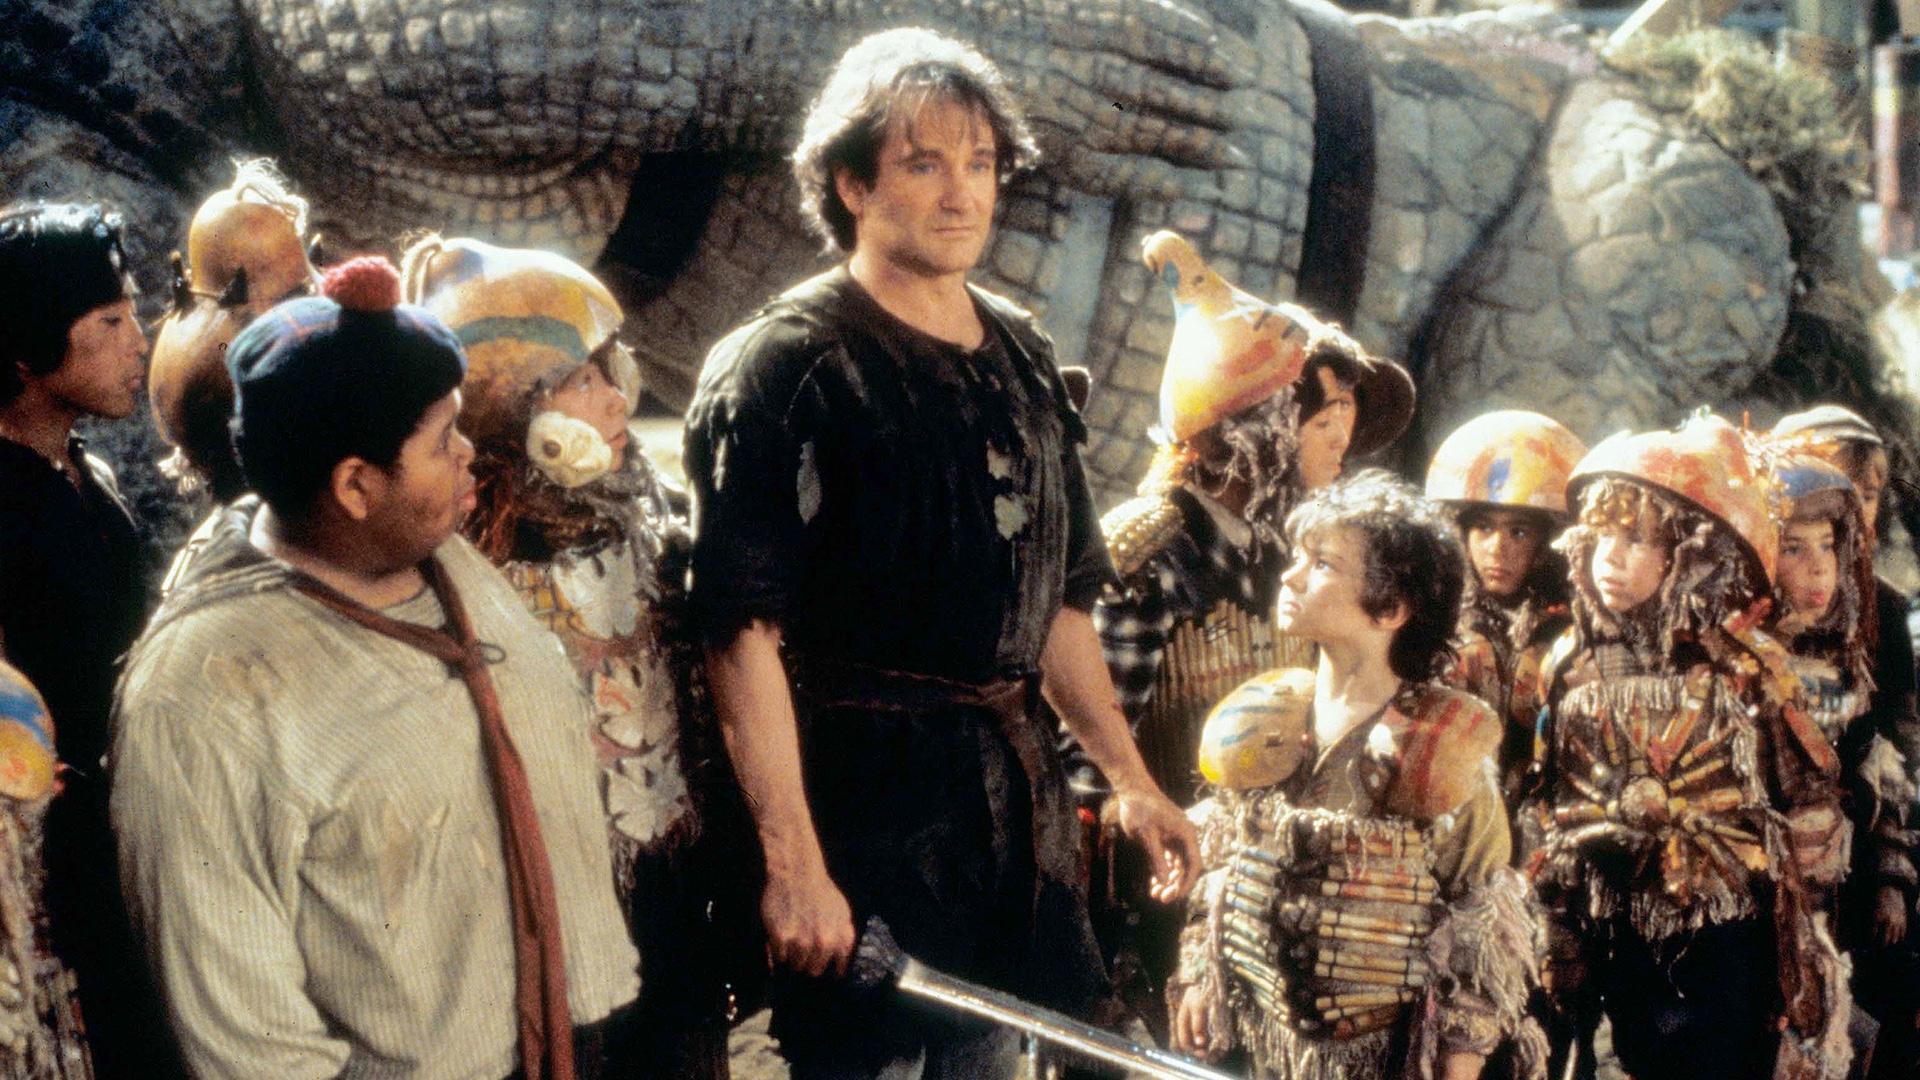 Honest Trailer For HOOK - Steven Spielberg's Least Favorite